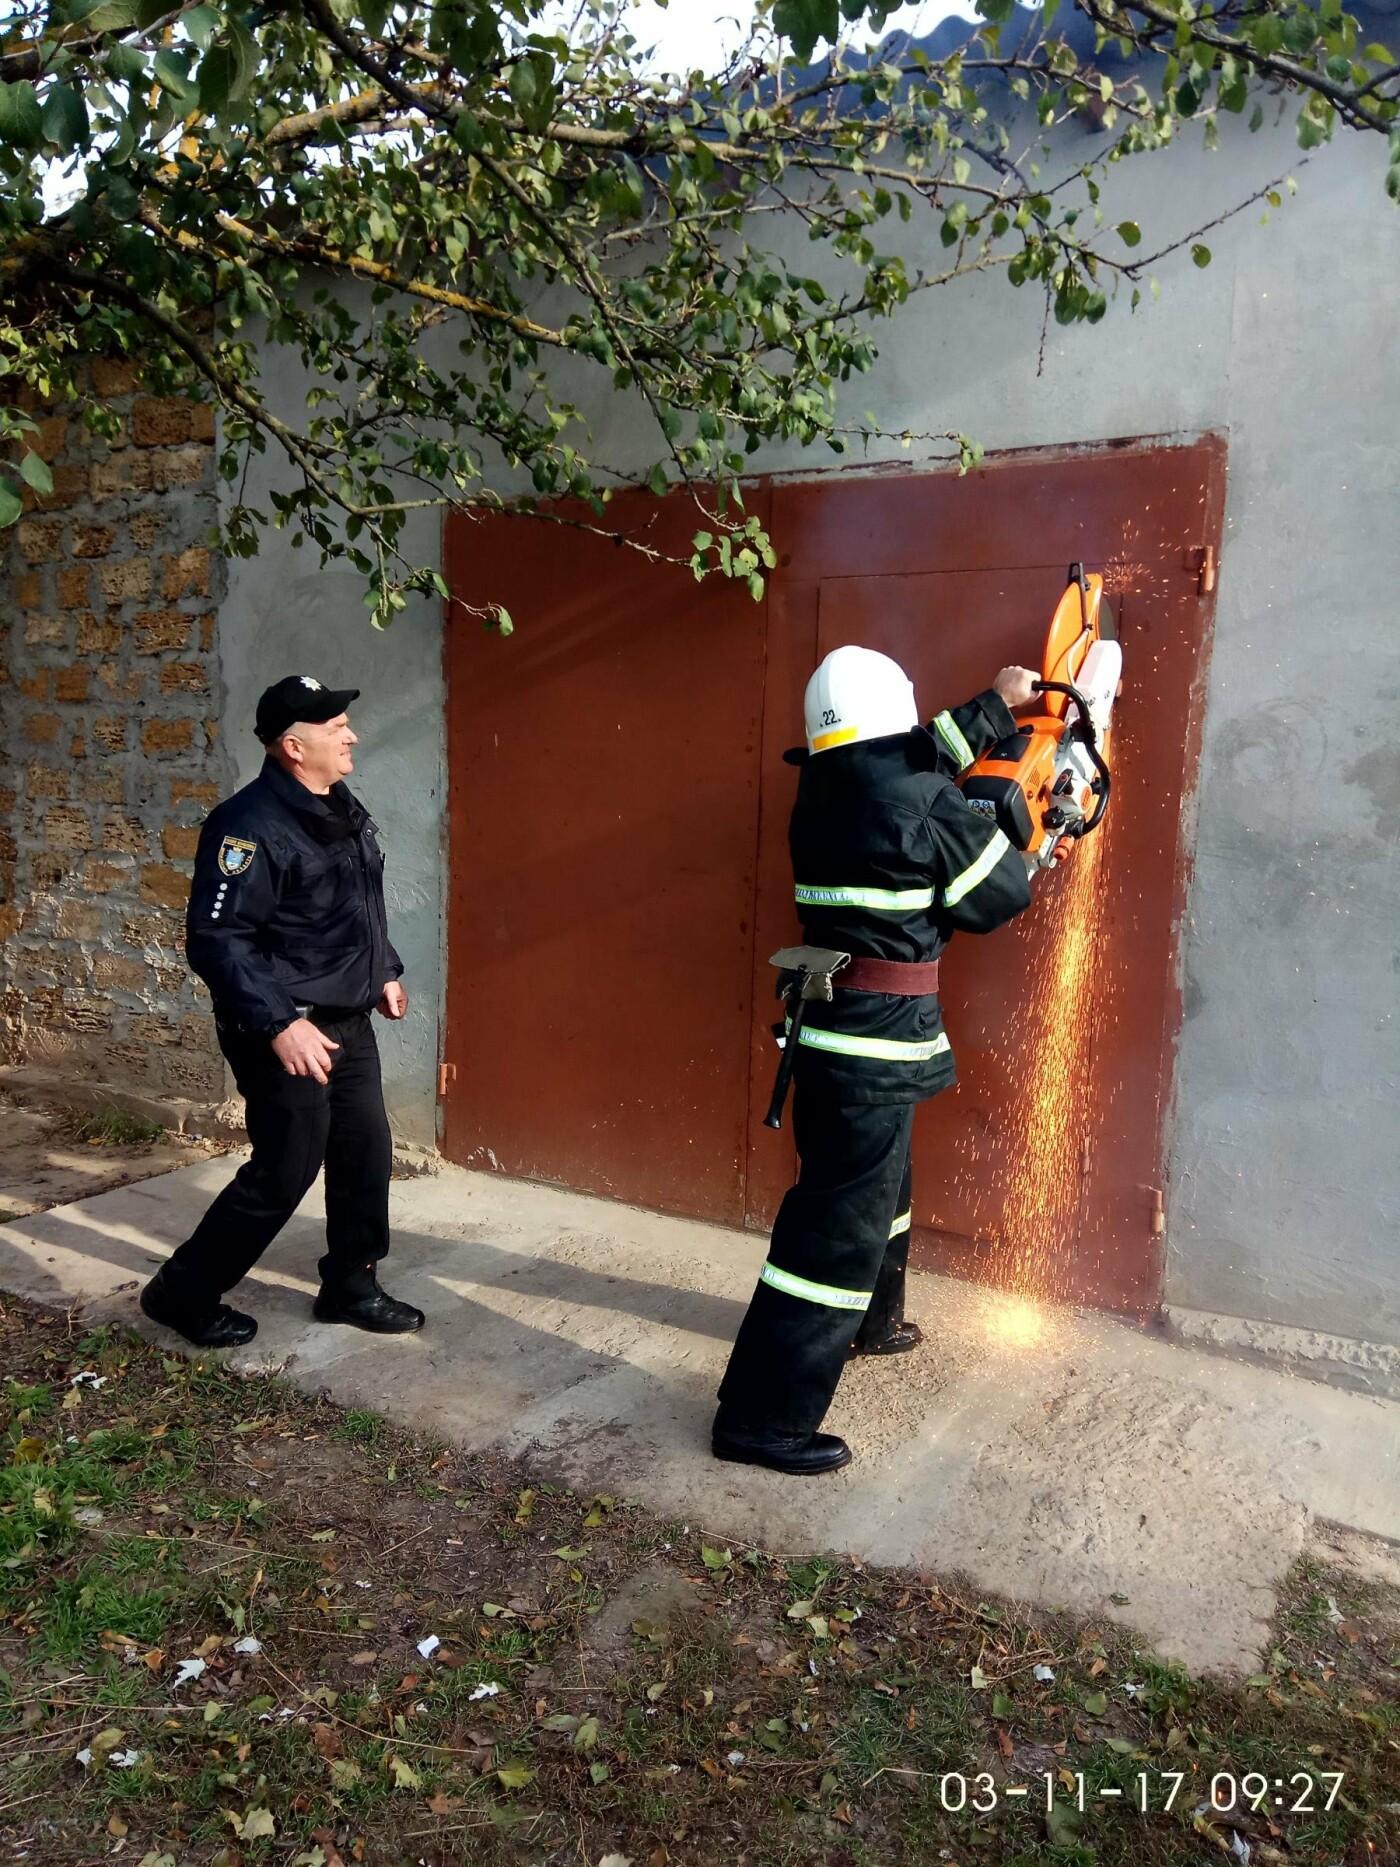 На Николаевщине спасатели предотвратили попытку суицида, - ФОТО, фото-1